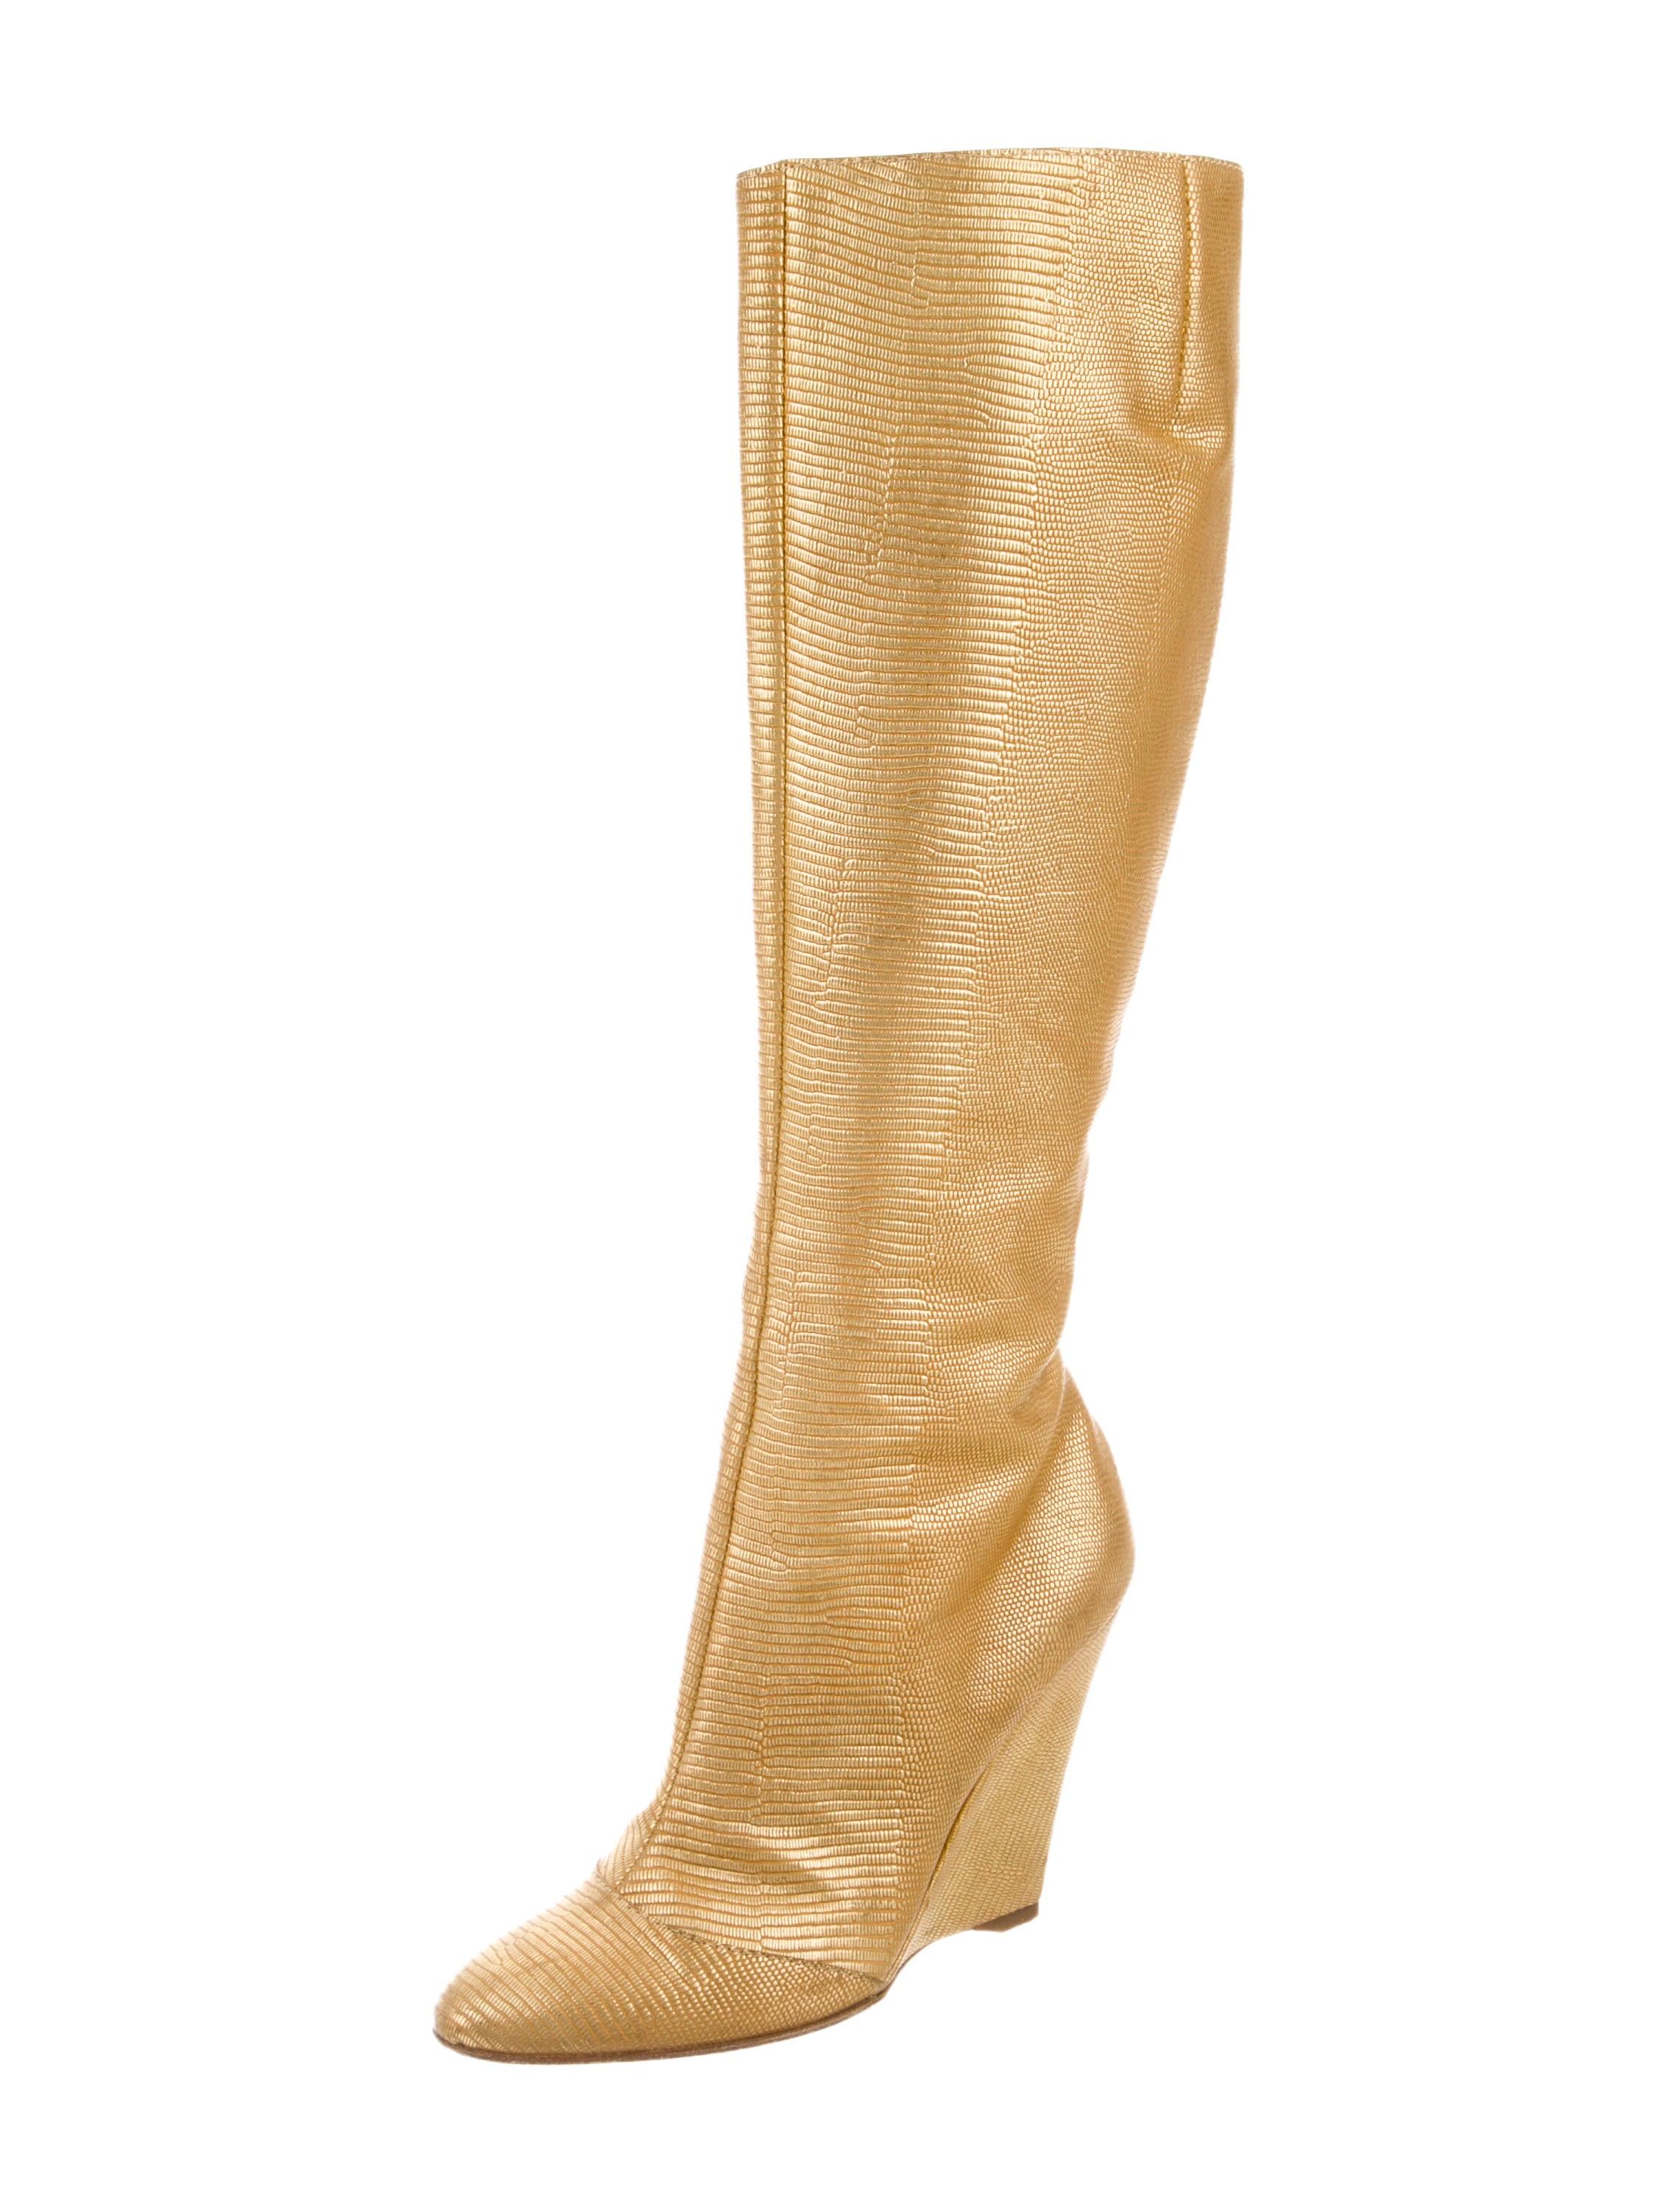 giuseppe zanotti metallic knee high boots shoes